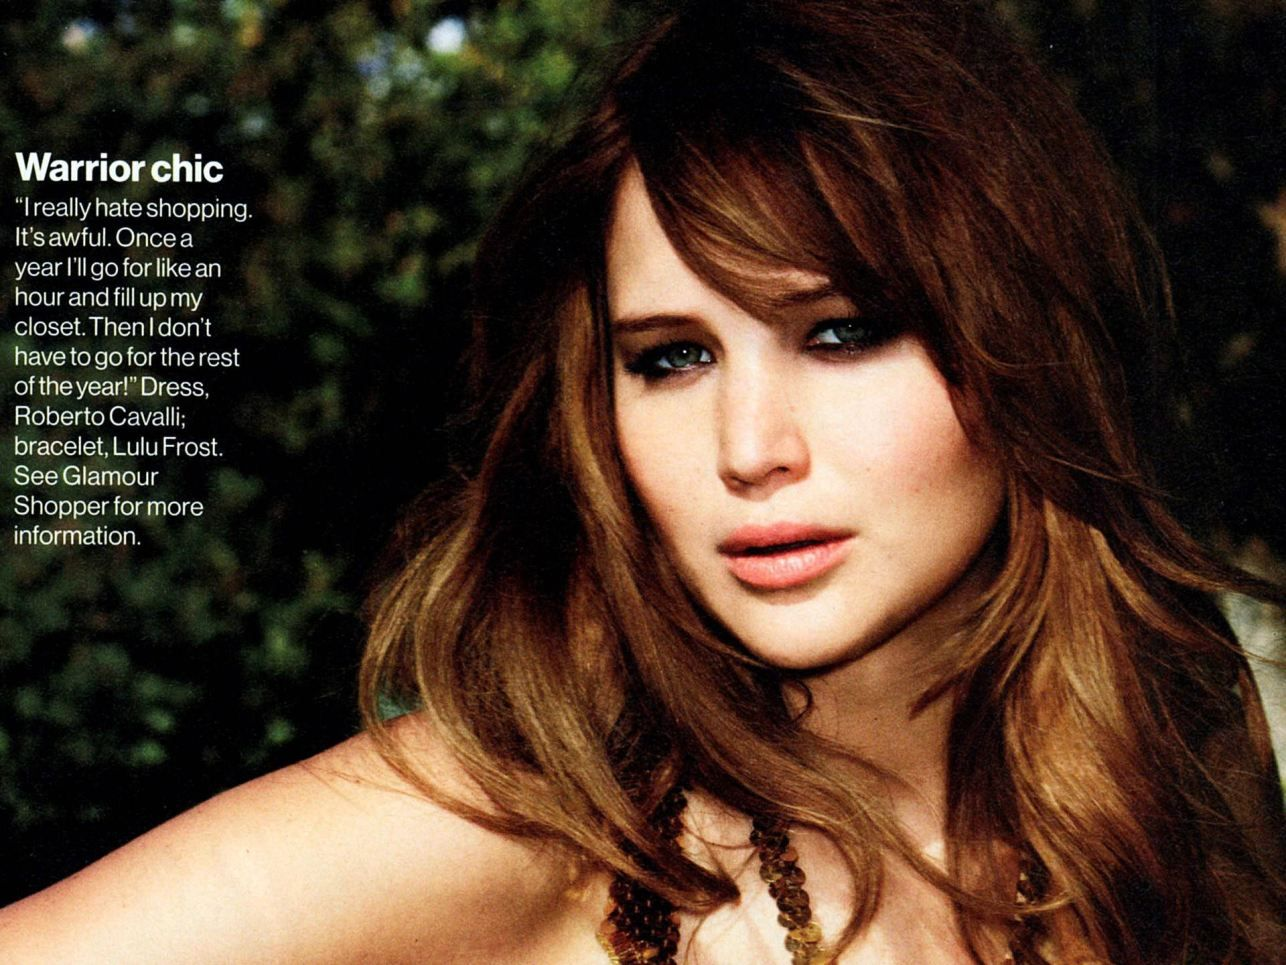 Jennifer Lawrence Wallpaper 21   Apnatimepasscom 1286x965